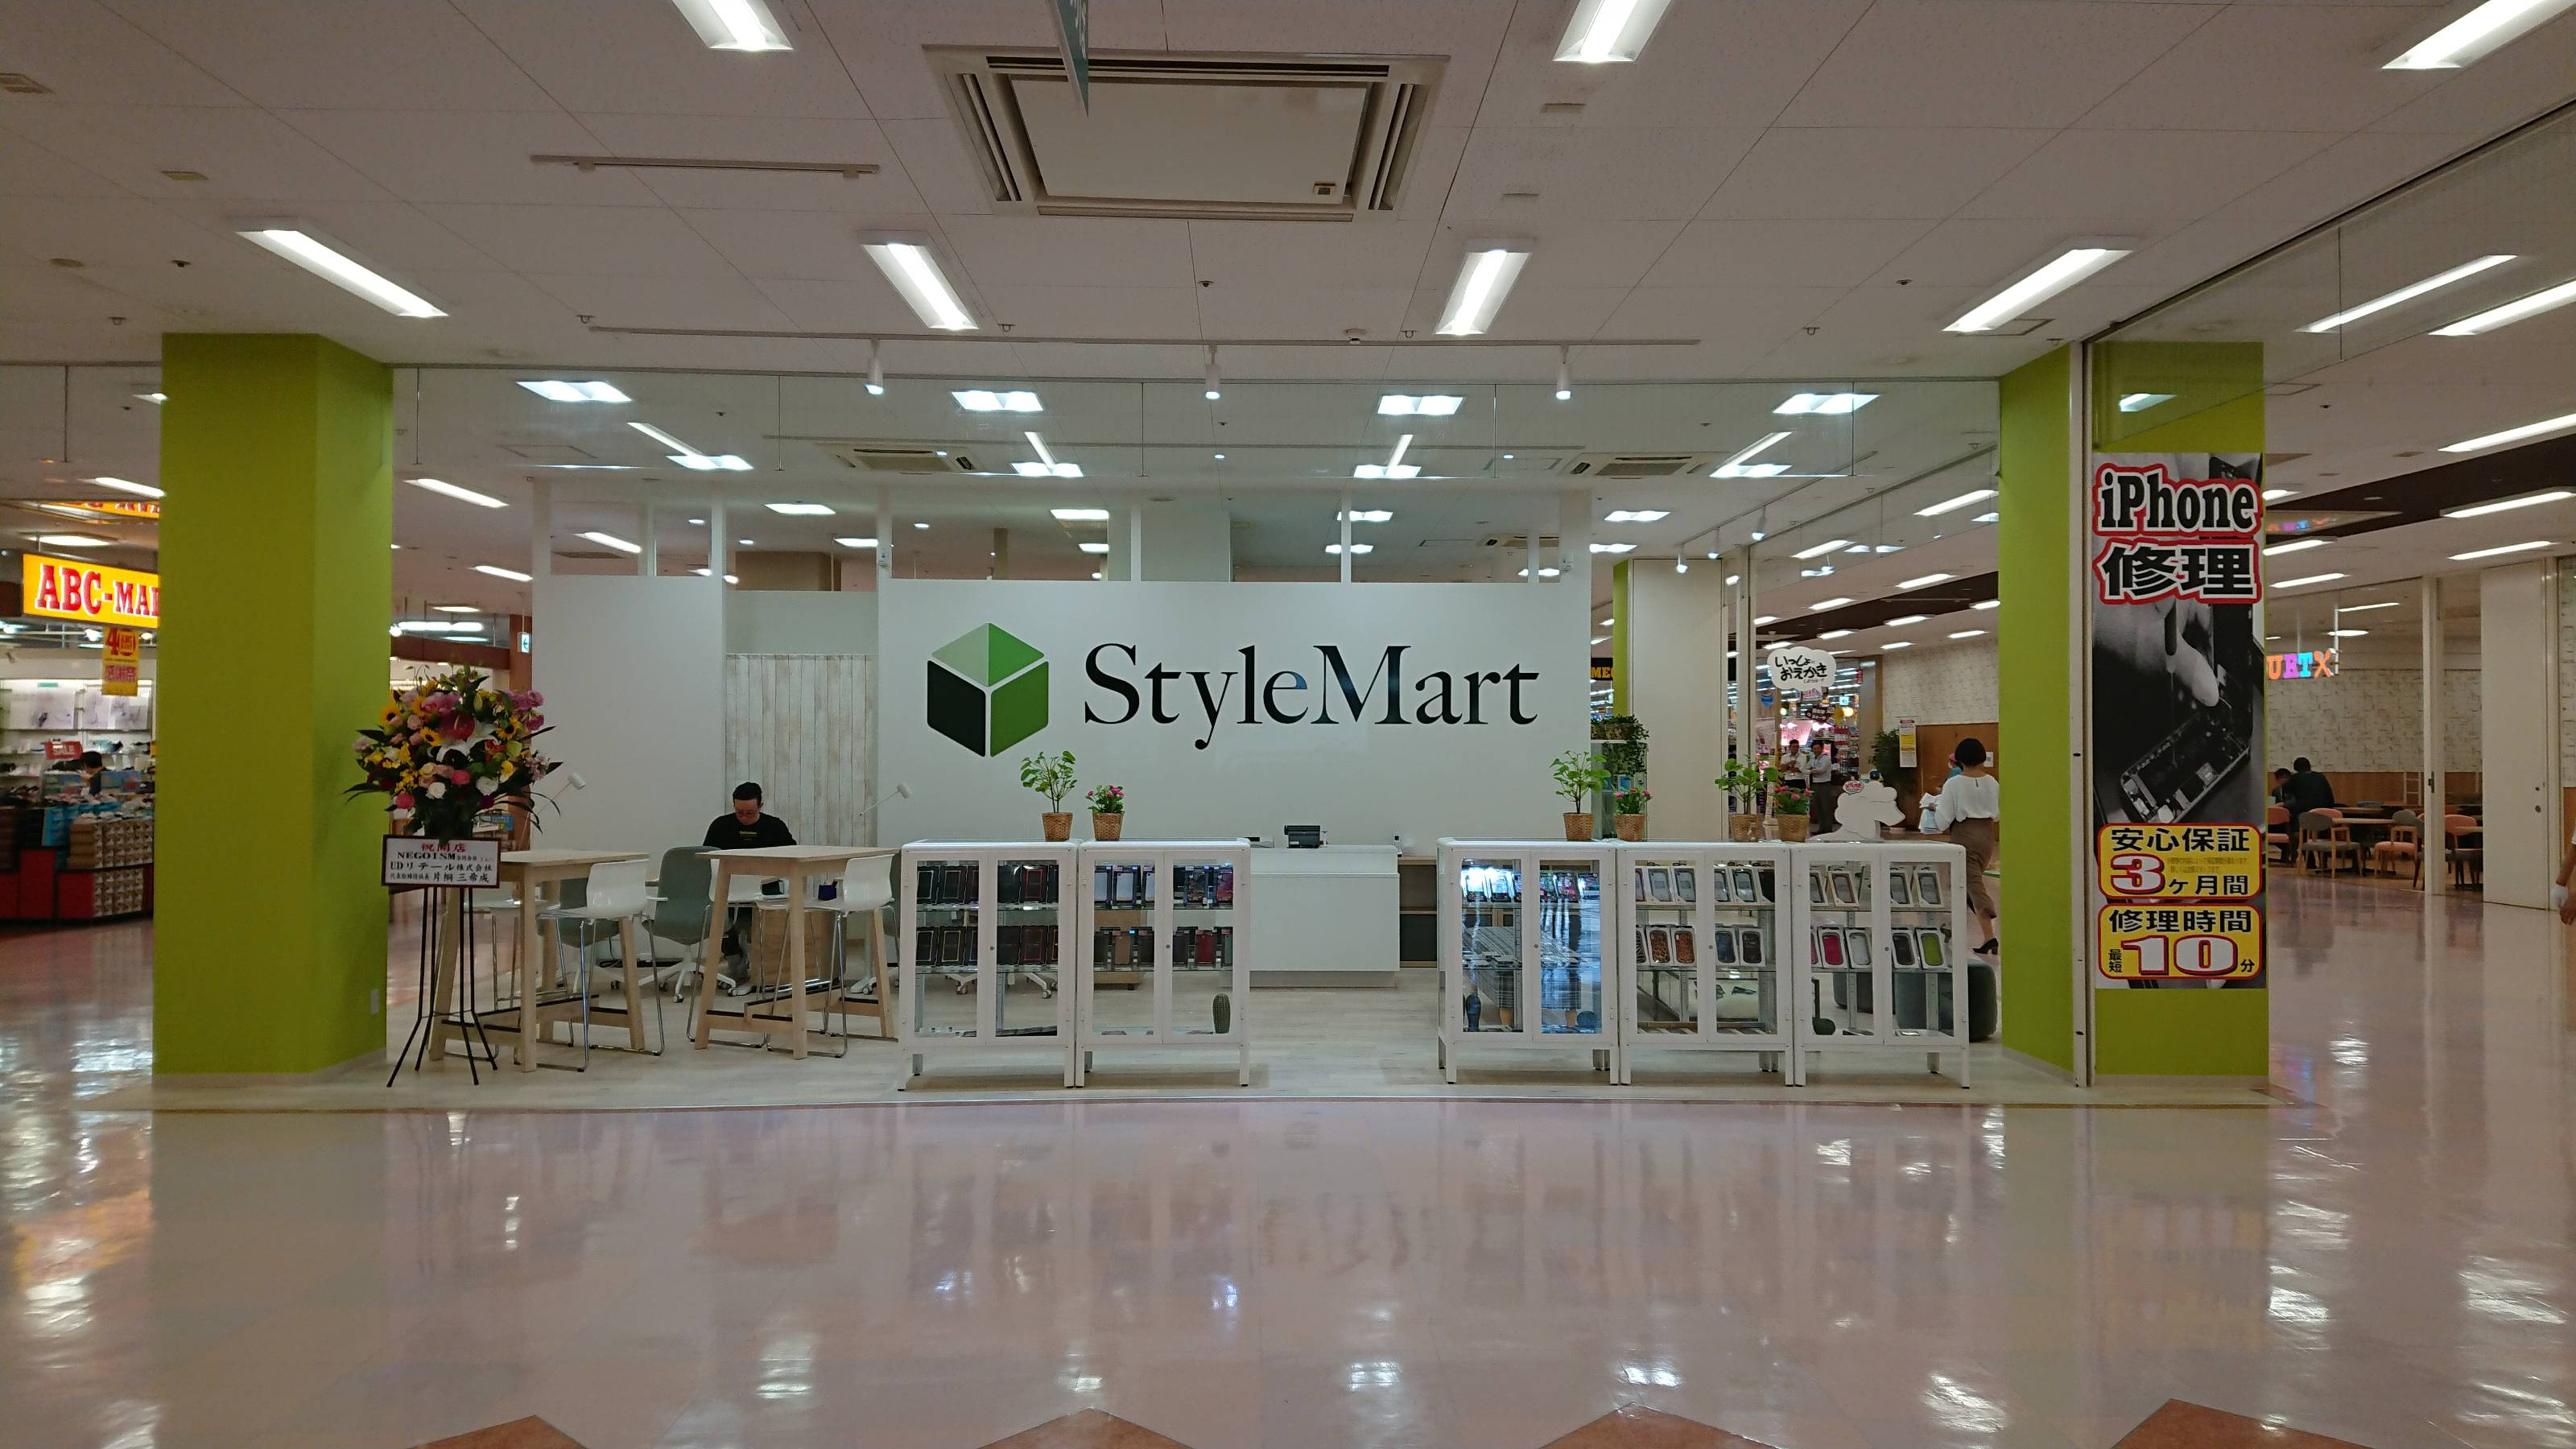 StyleMart MEGAドンキホーテUNY鈴鹿店